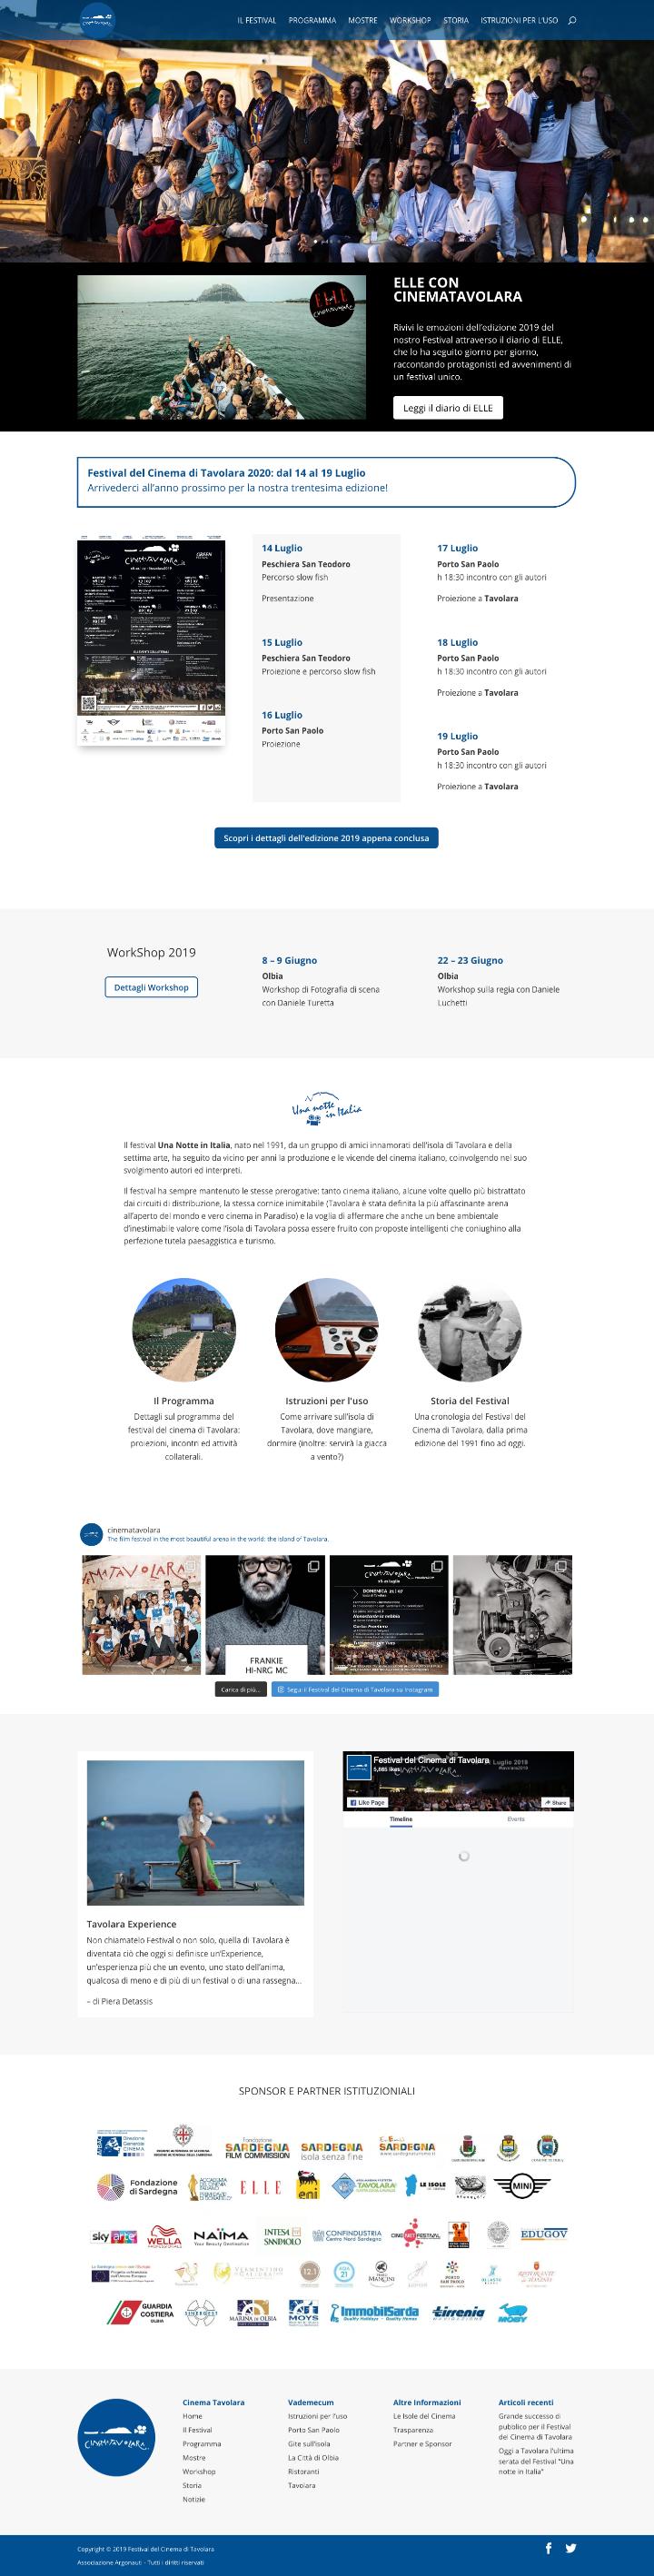 Festival del Cinema di Tavolara homepage screenshot